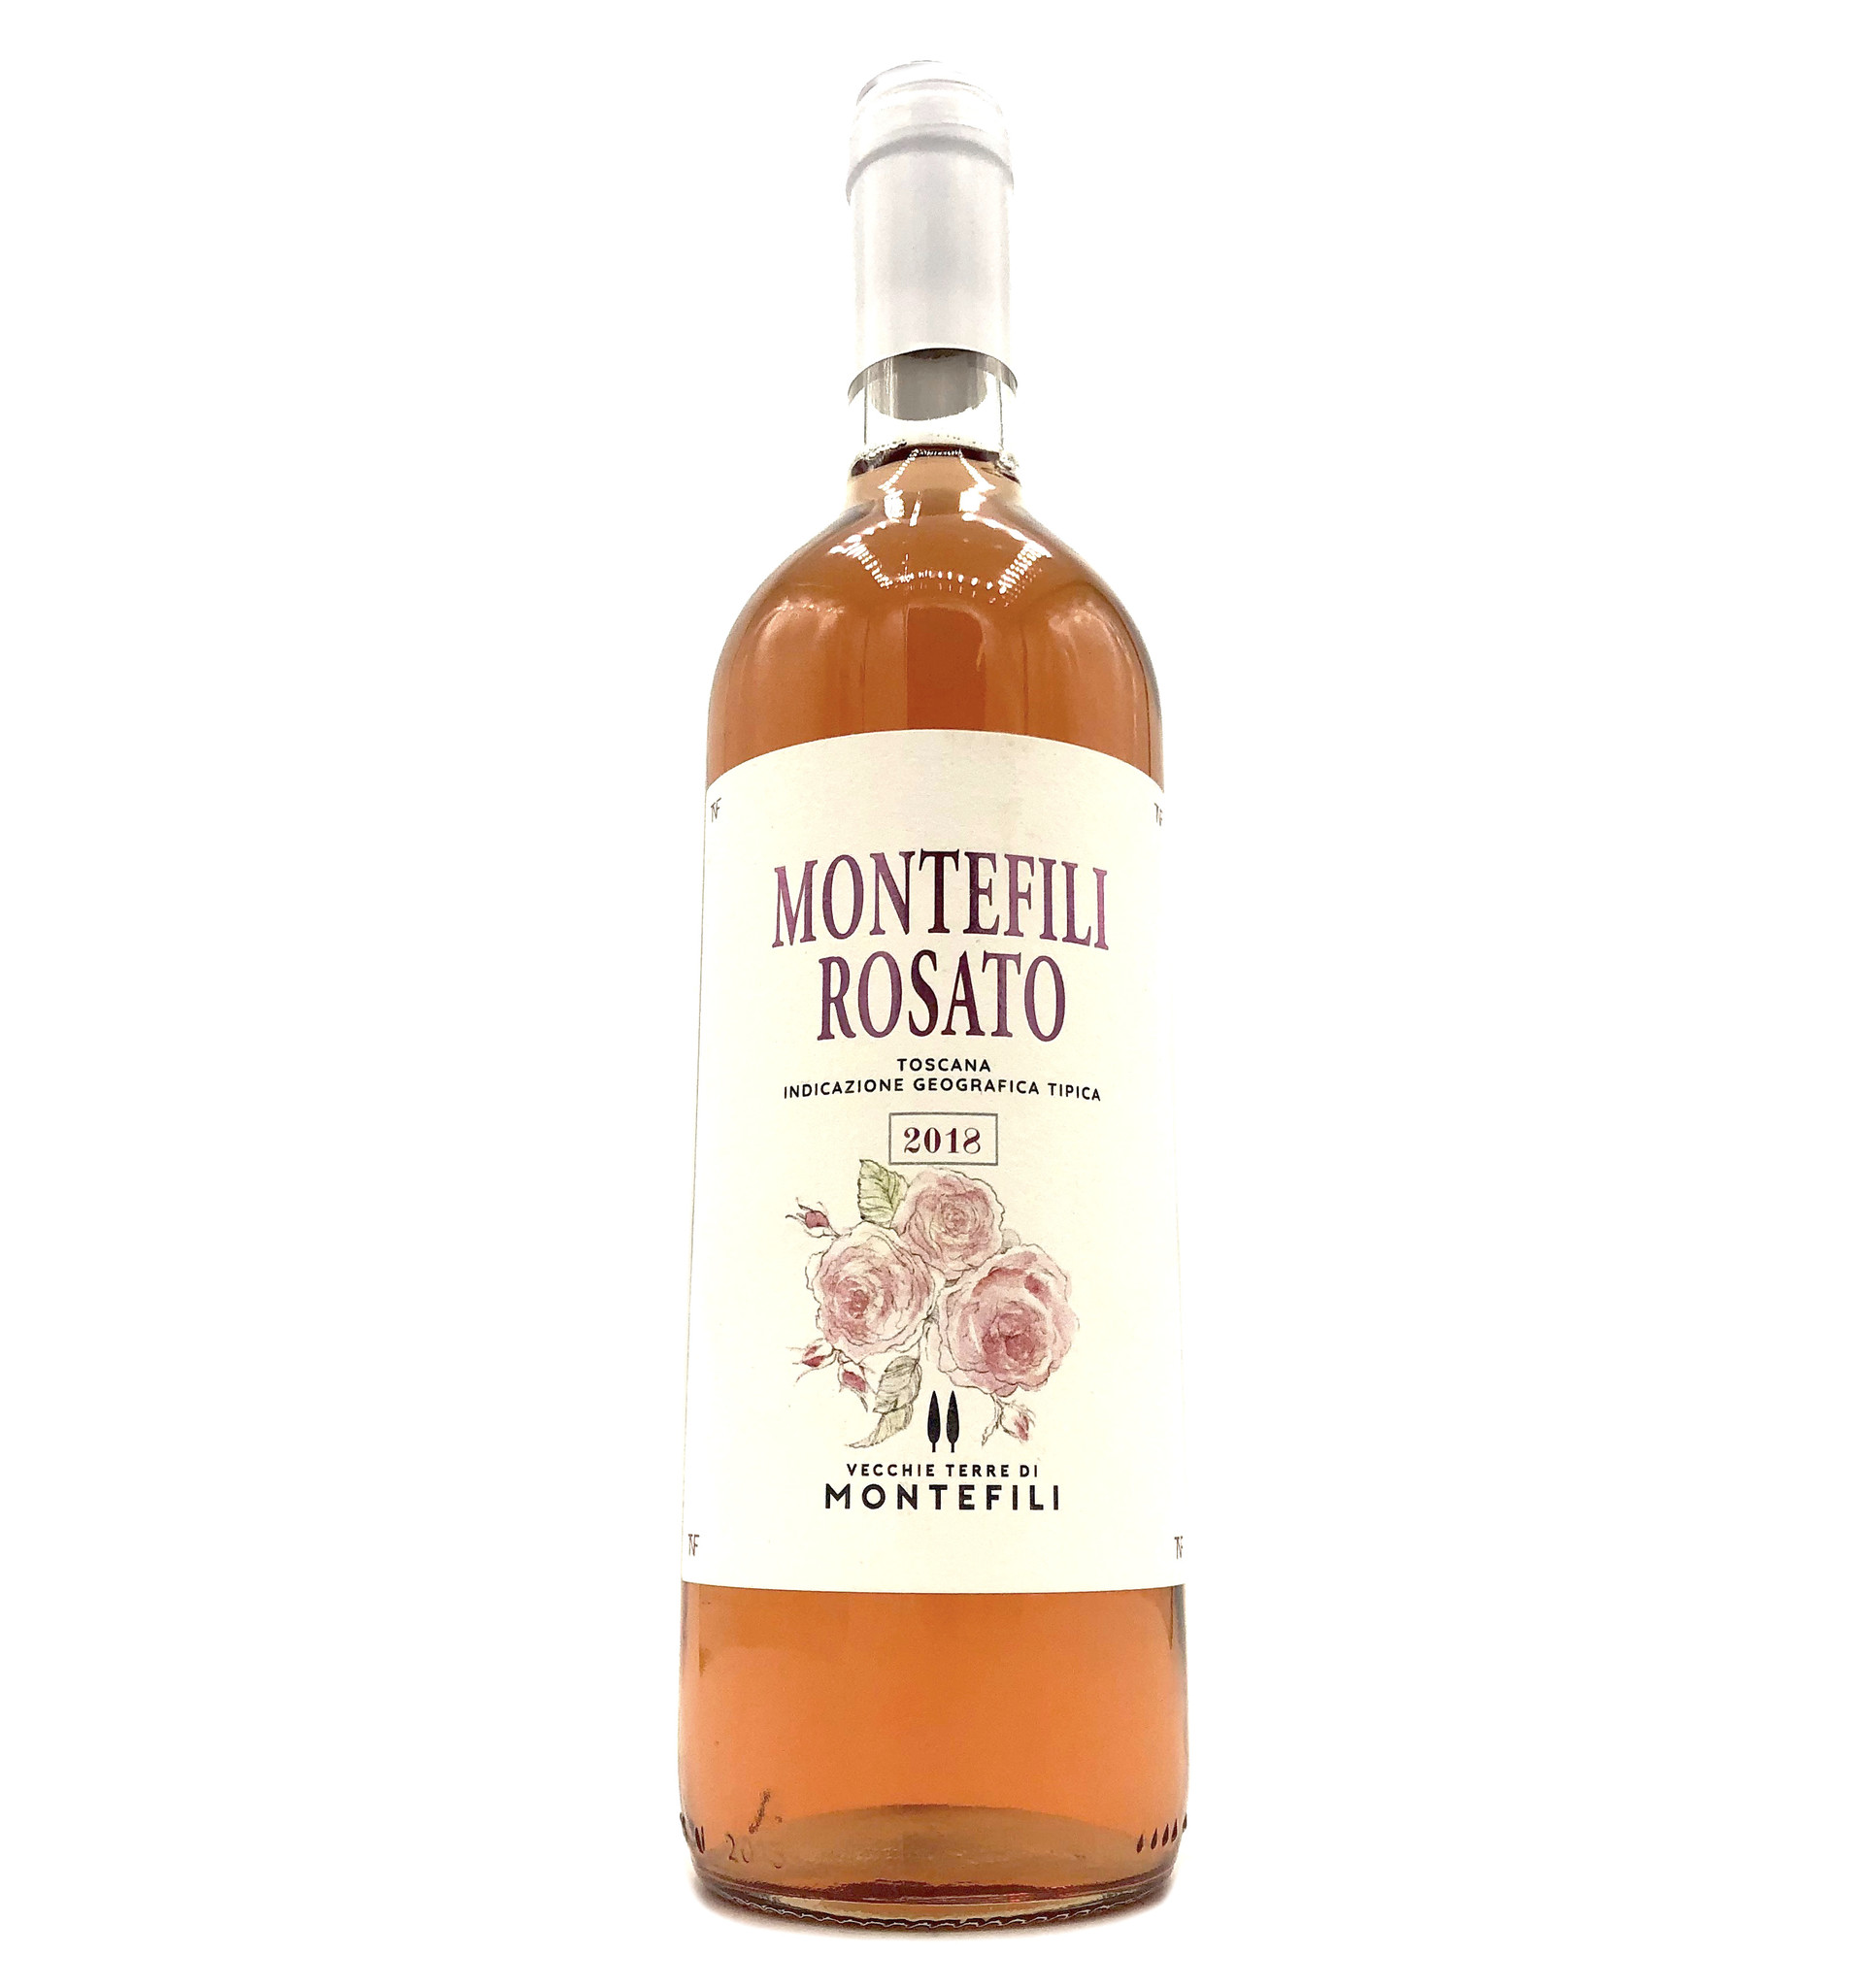 Toscana Rosato 2018 Montefili